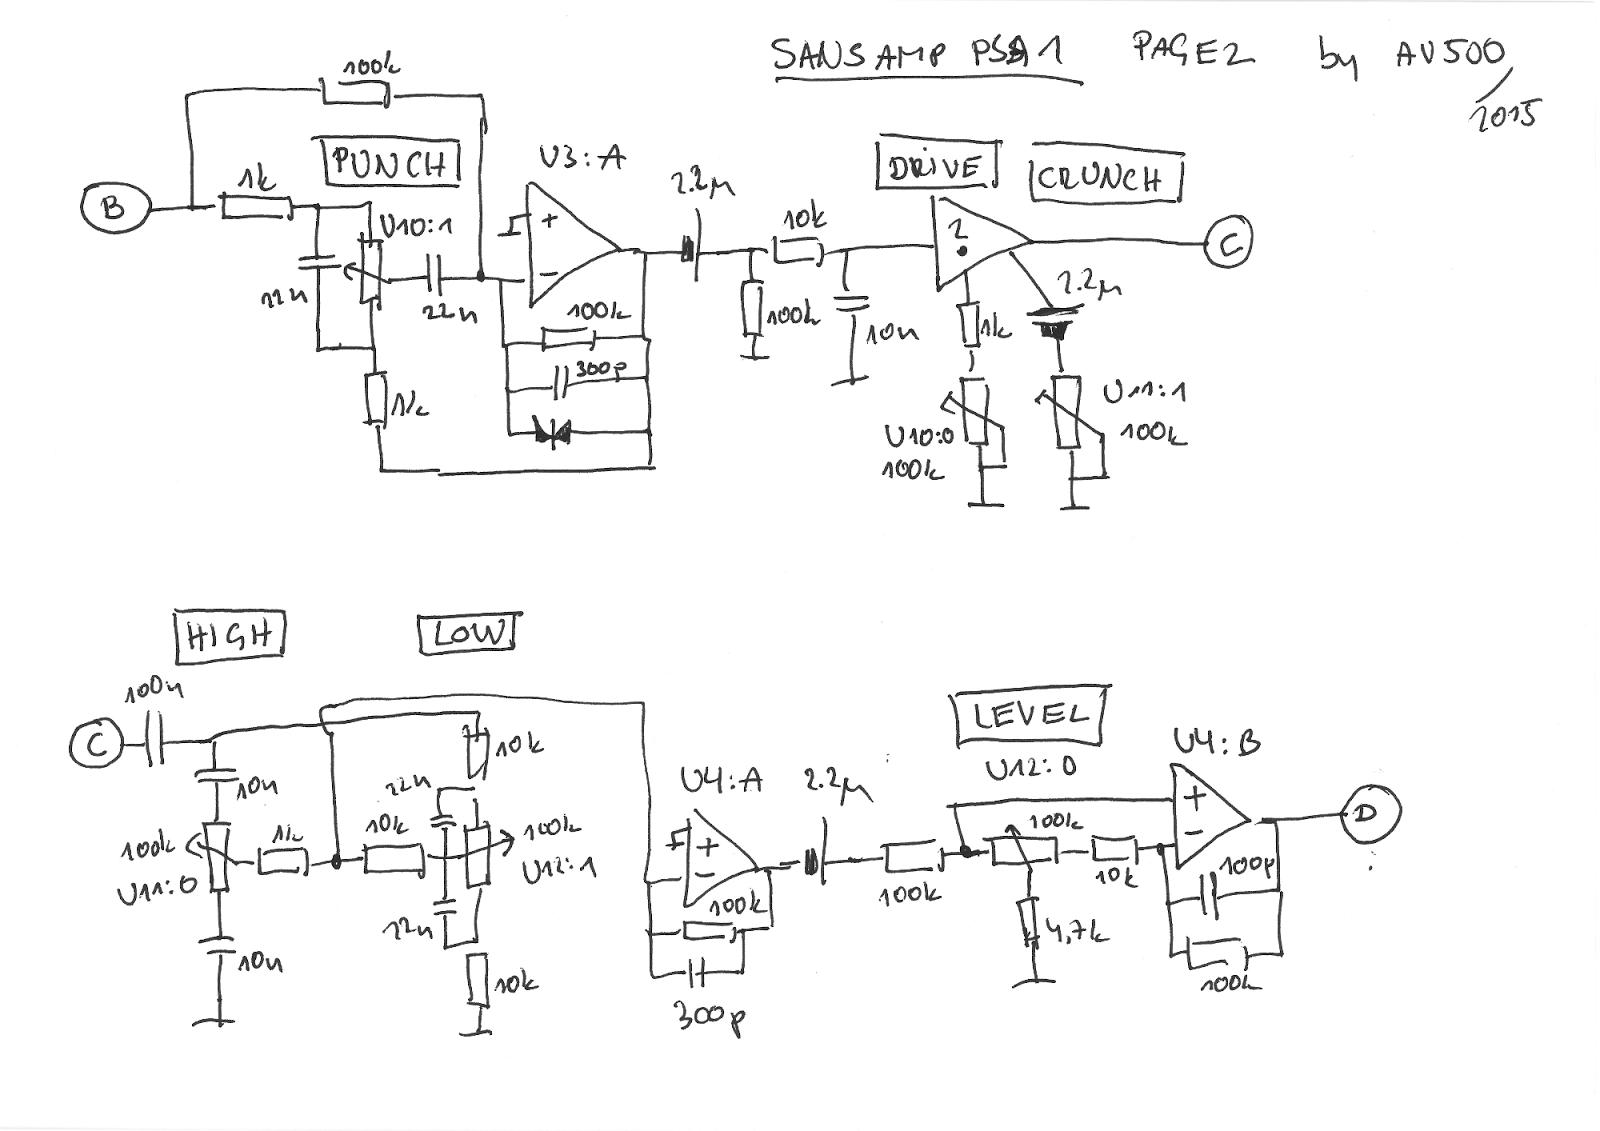 usr/local: TECH 21 SansAmp PSA-1 PCB traces and schematics